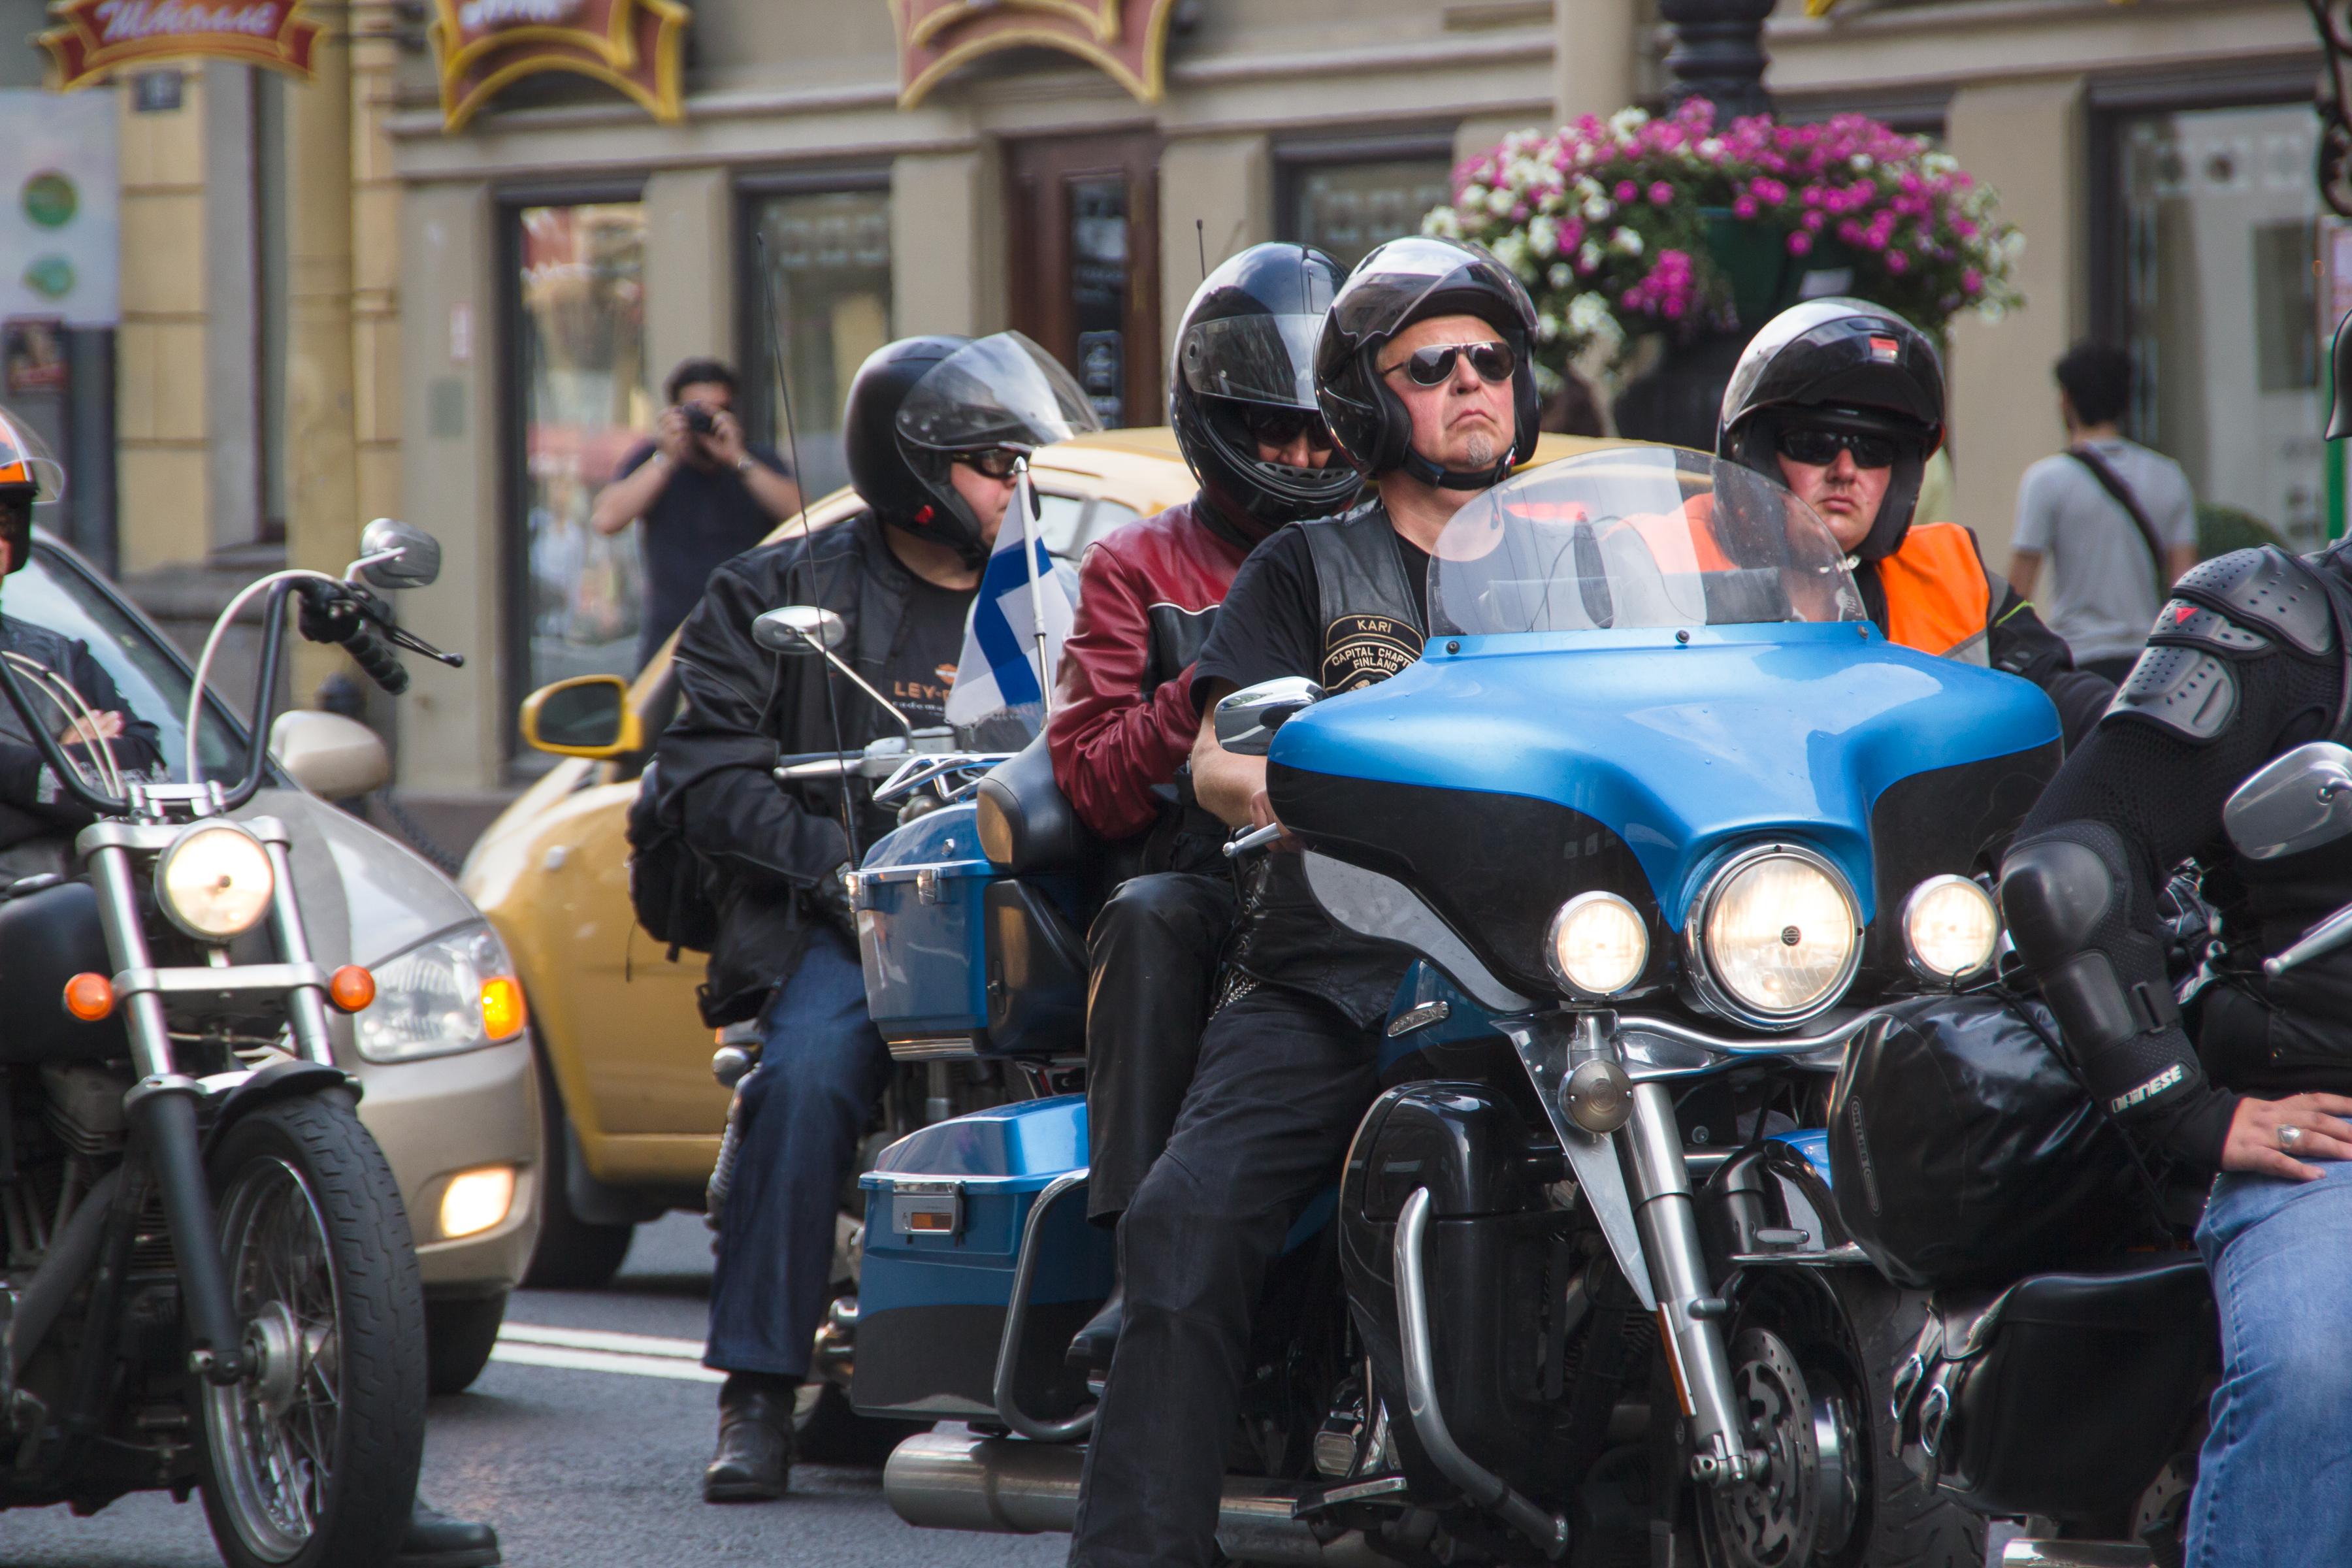 motorcyclists, Adult, Motor, Transportation, Transport, HQ Photo